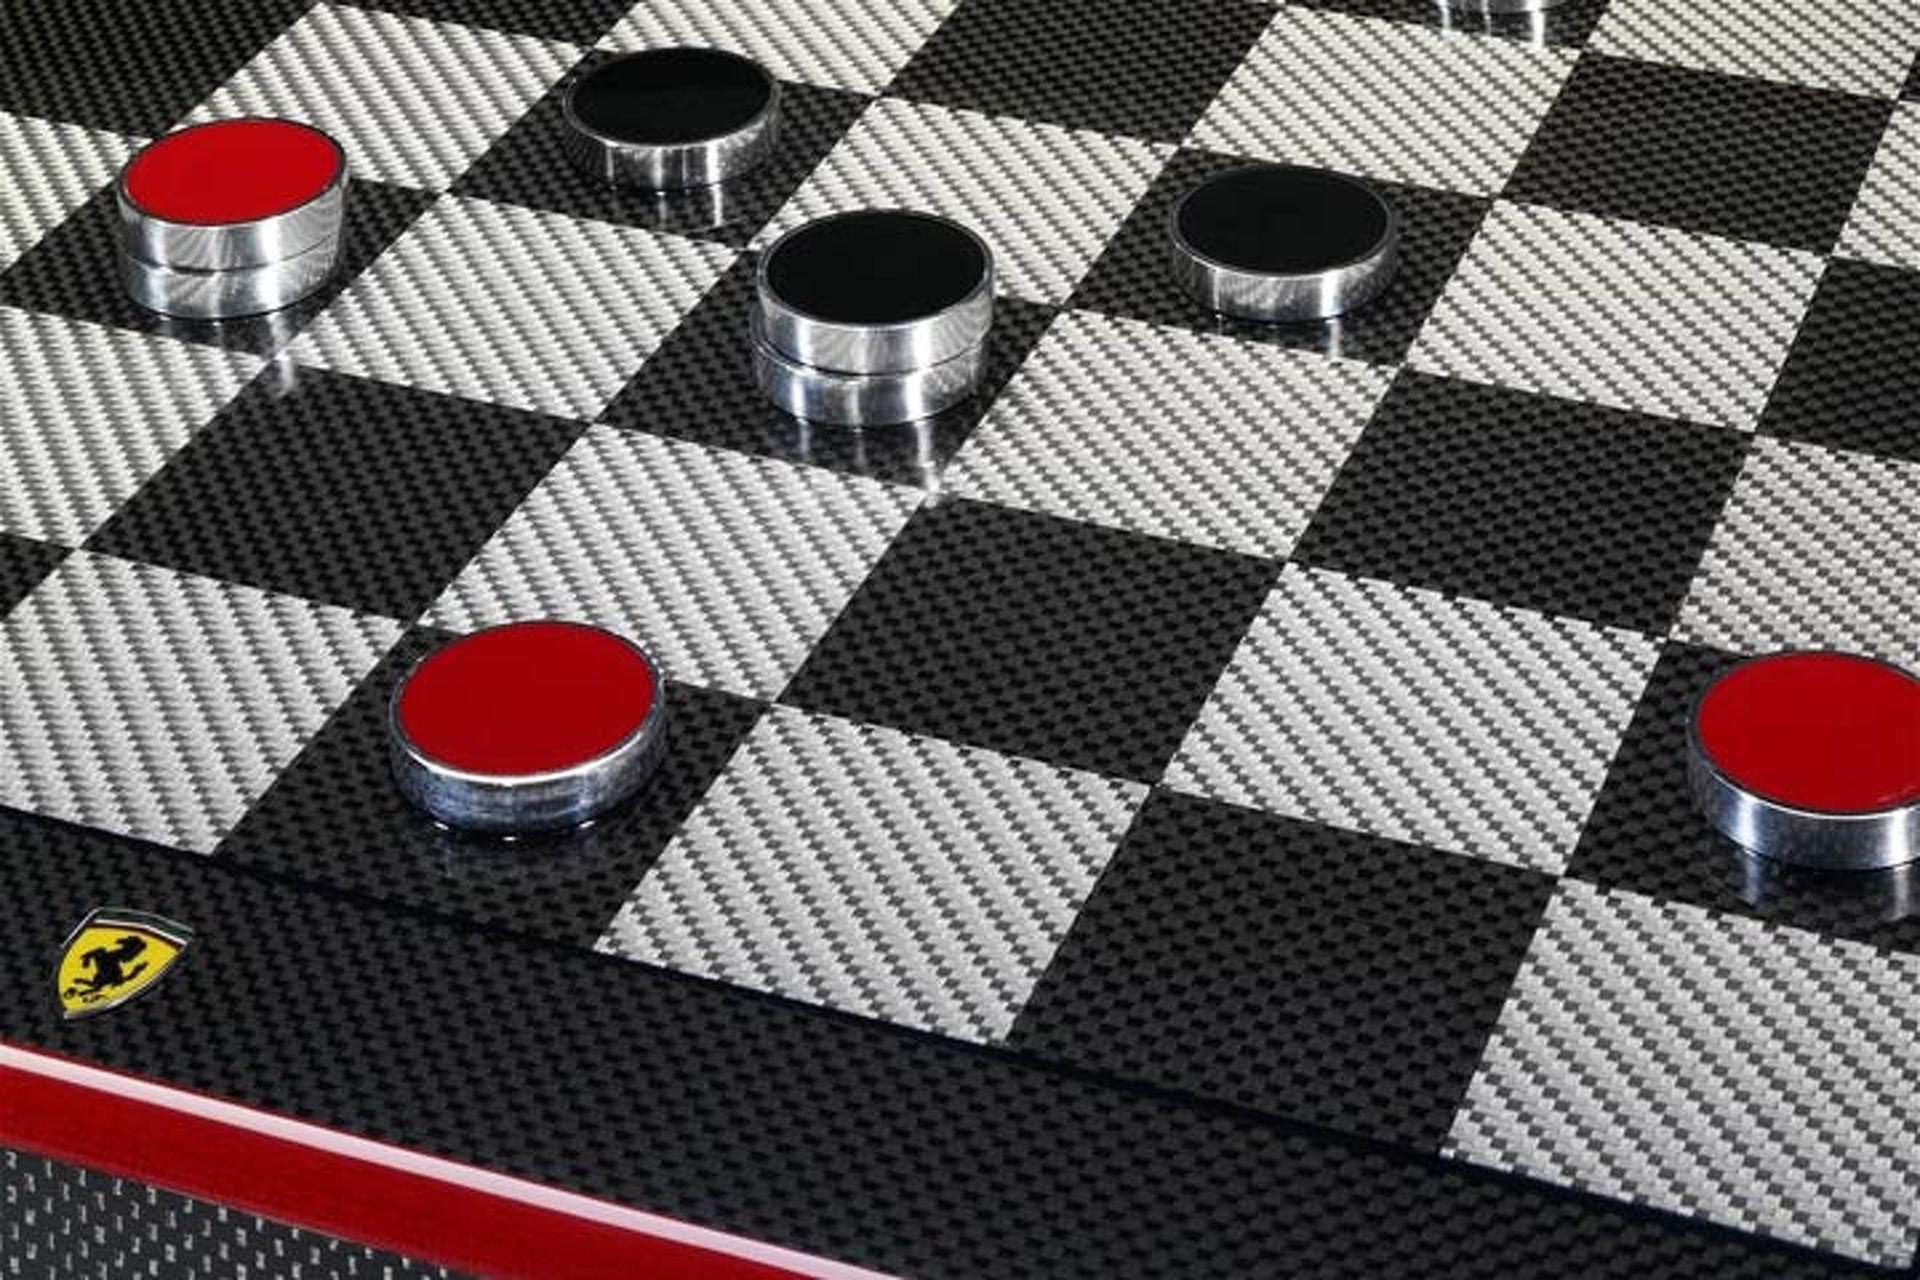 Make Your Move on this Carbon Fiber Ferrari Chess Set